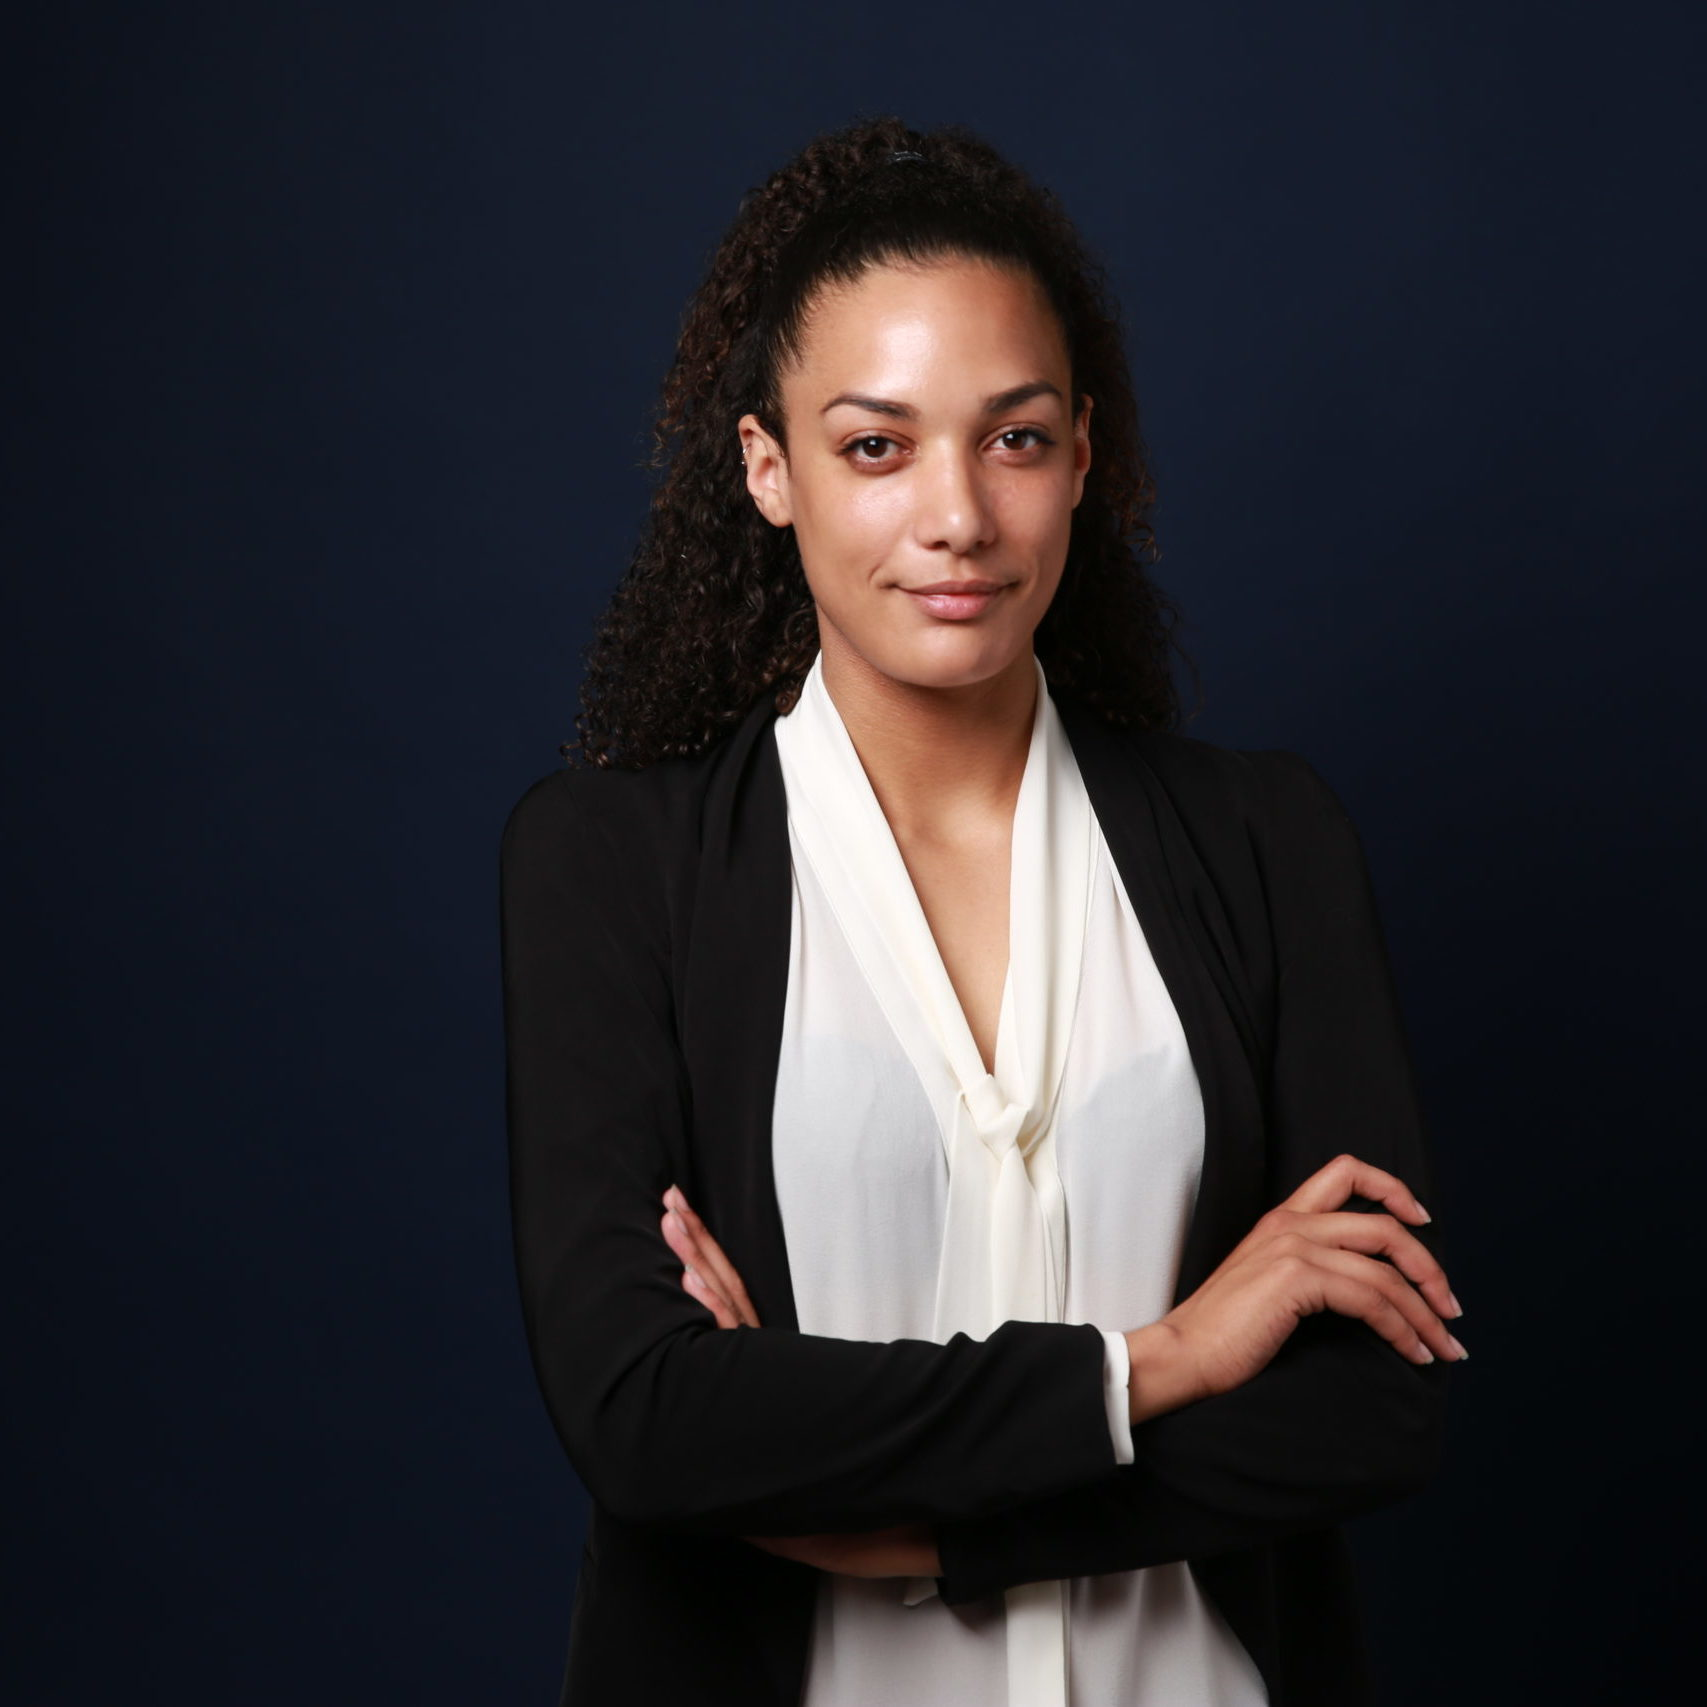 Sibylle Diallo Leblanc avocate